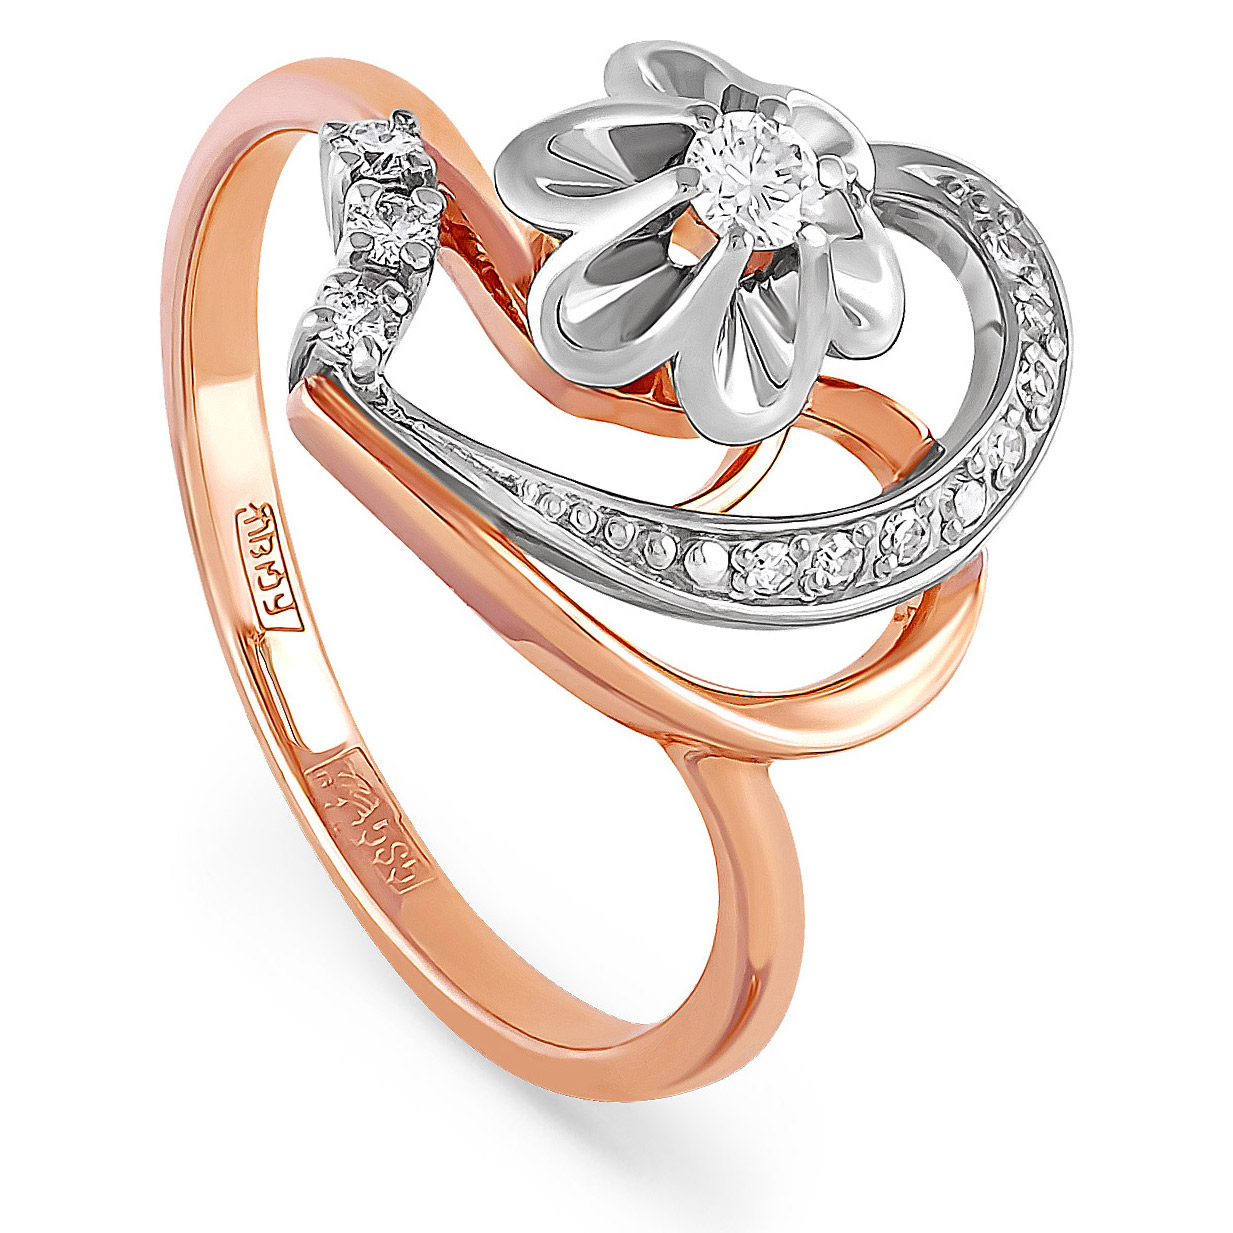 Золотое кольцо Бриллиант арт. 11-0328-1000 11-0328-1000